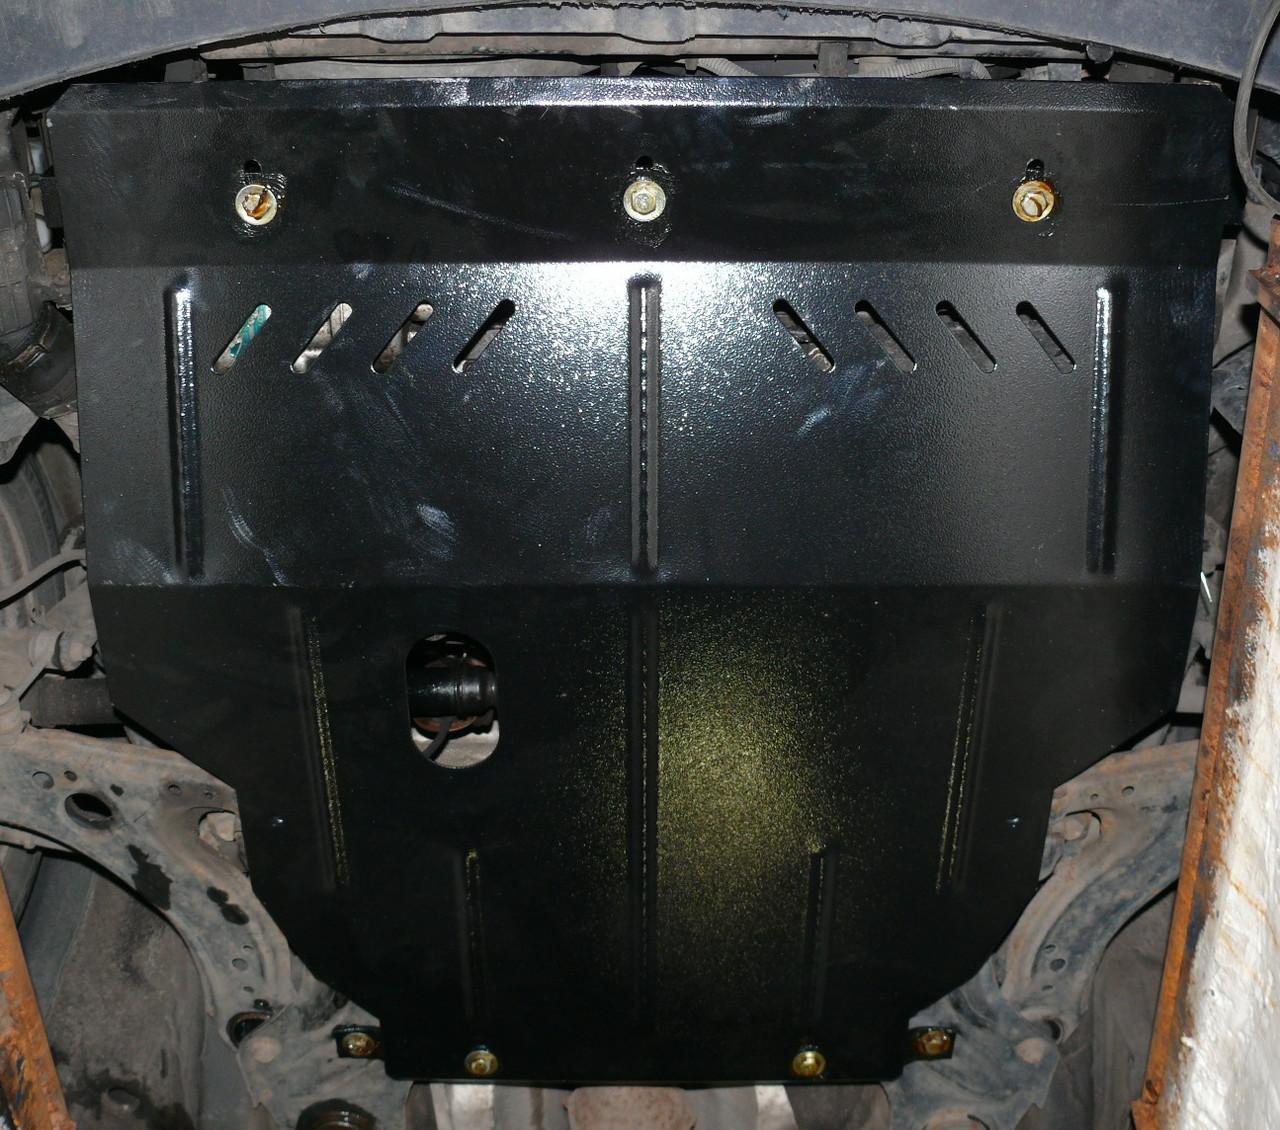 Защита двигателя на Ауди 80 Б4 (Audi 80 B4) 1991-1995 г